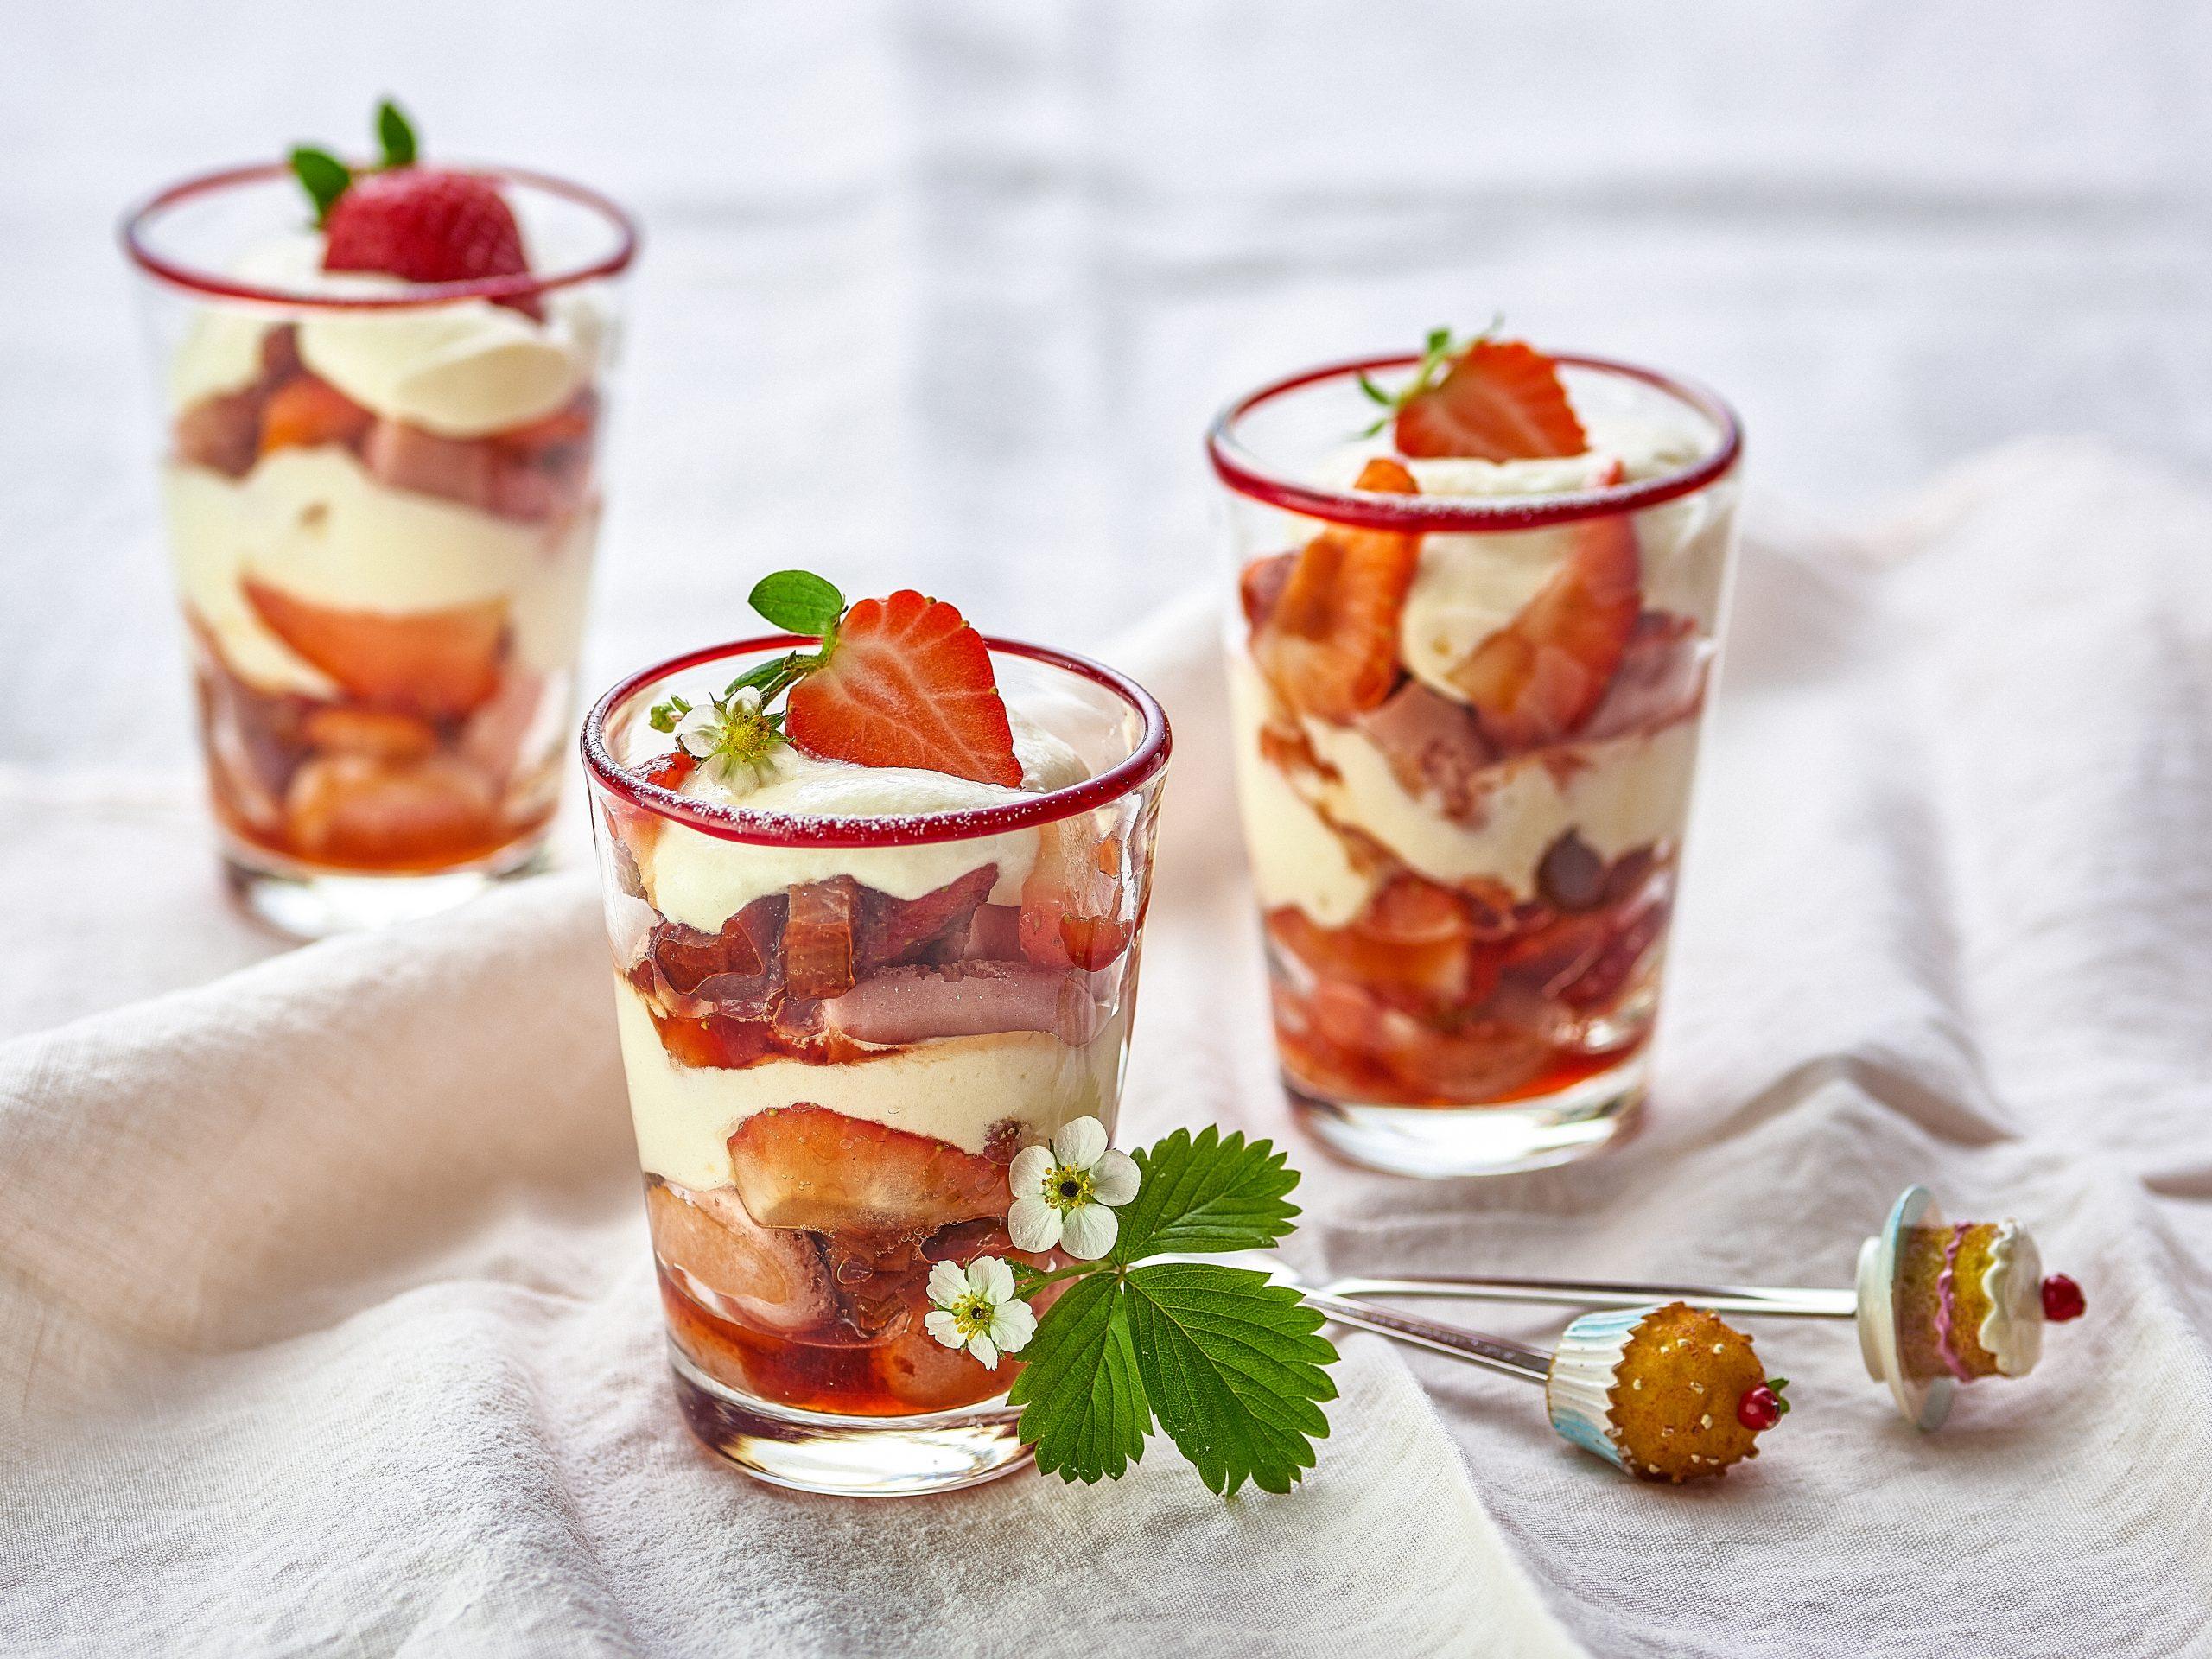 Erdbeer-Rhabarber-Tiramisu im Glas